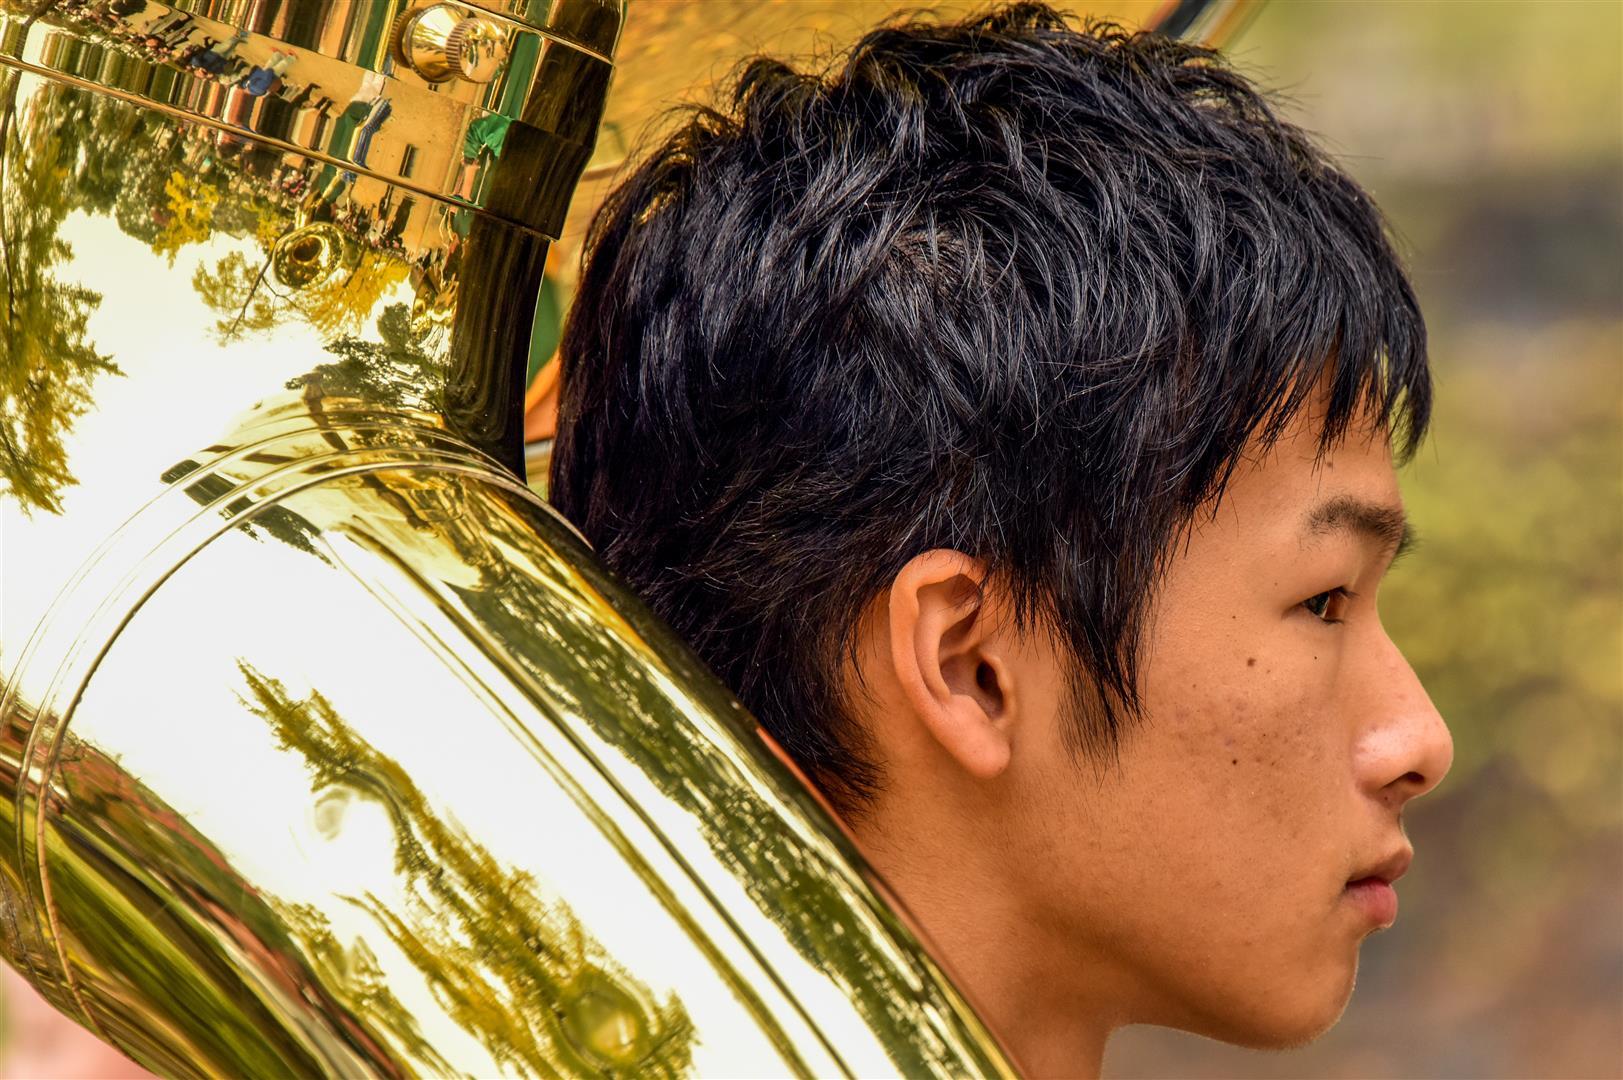 Japanes Tuba (Large)